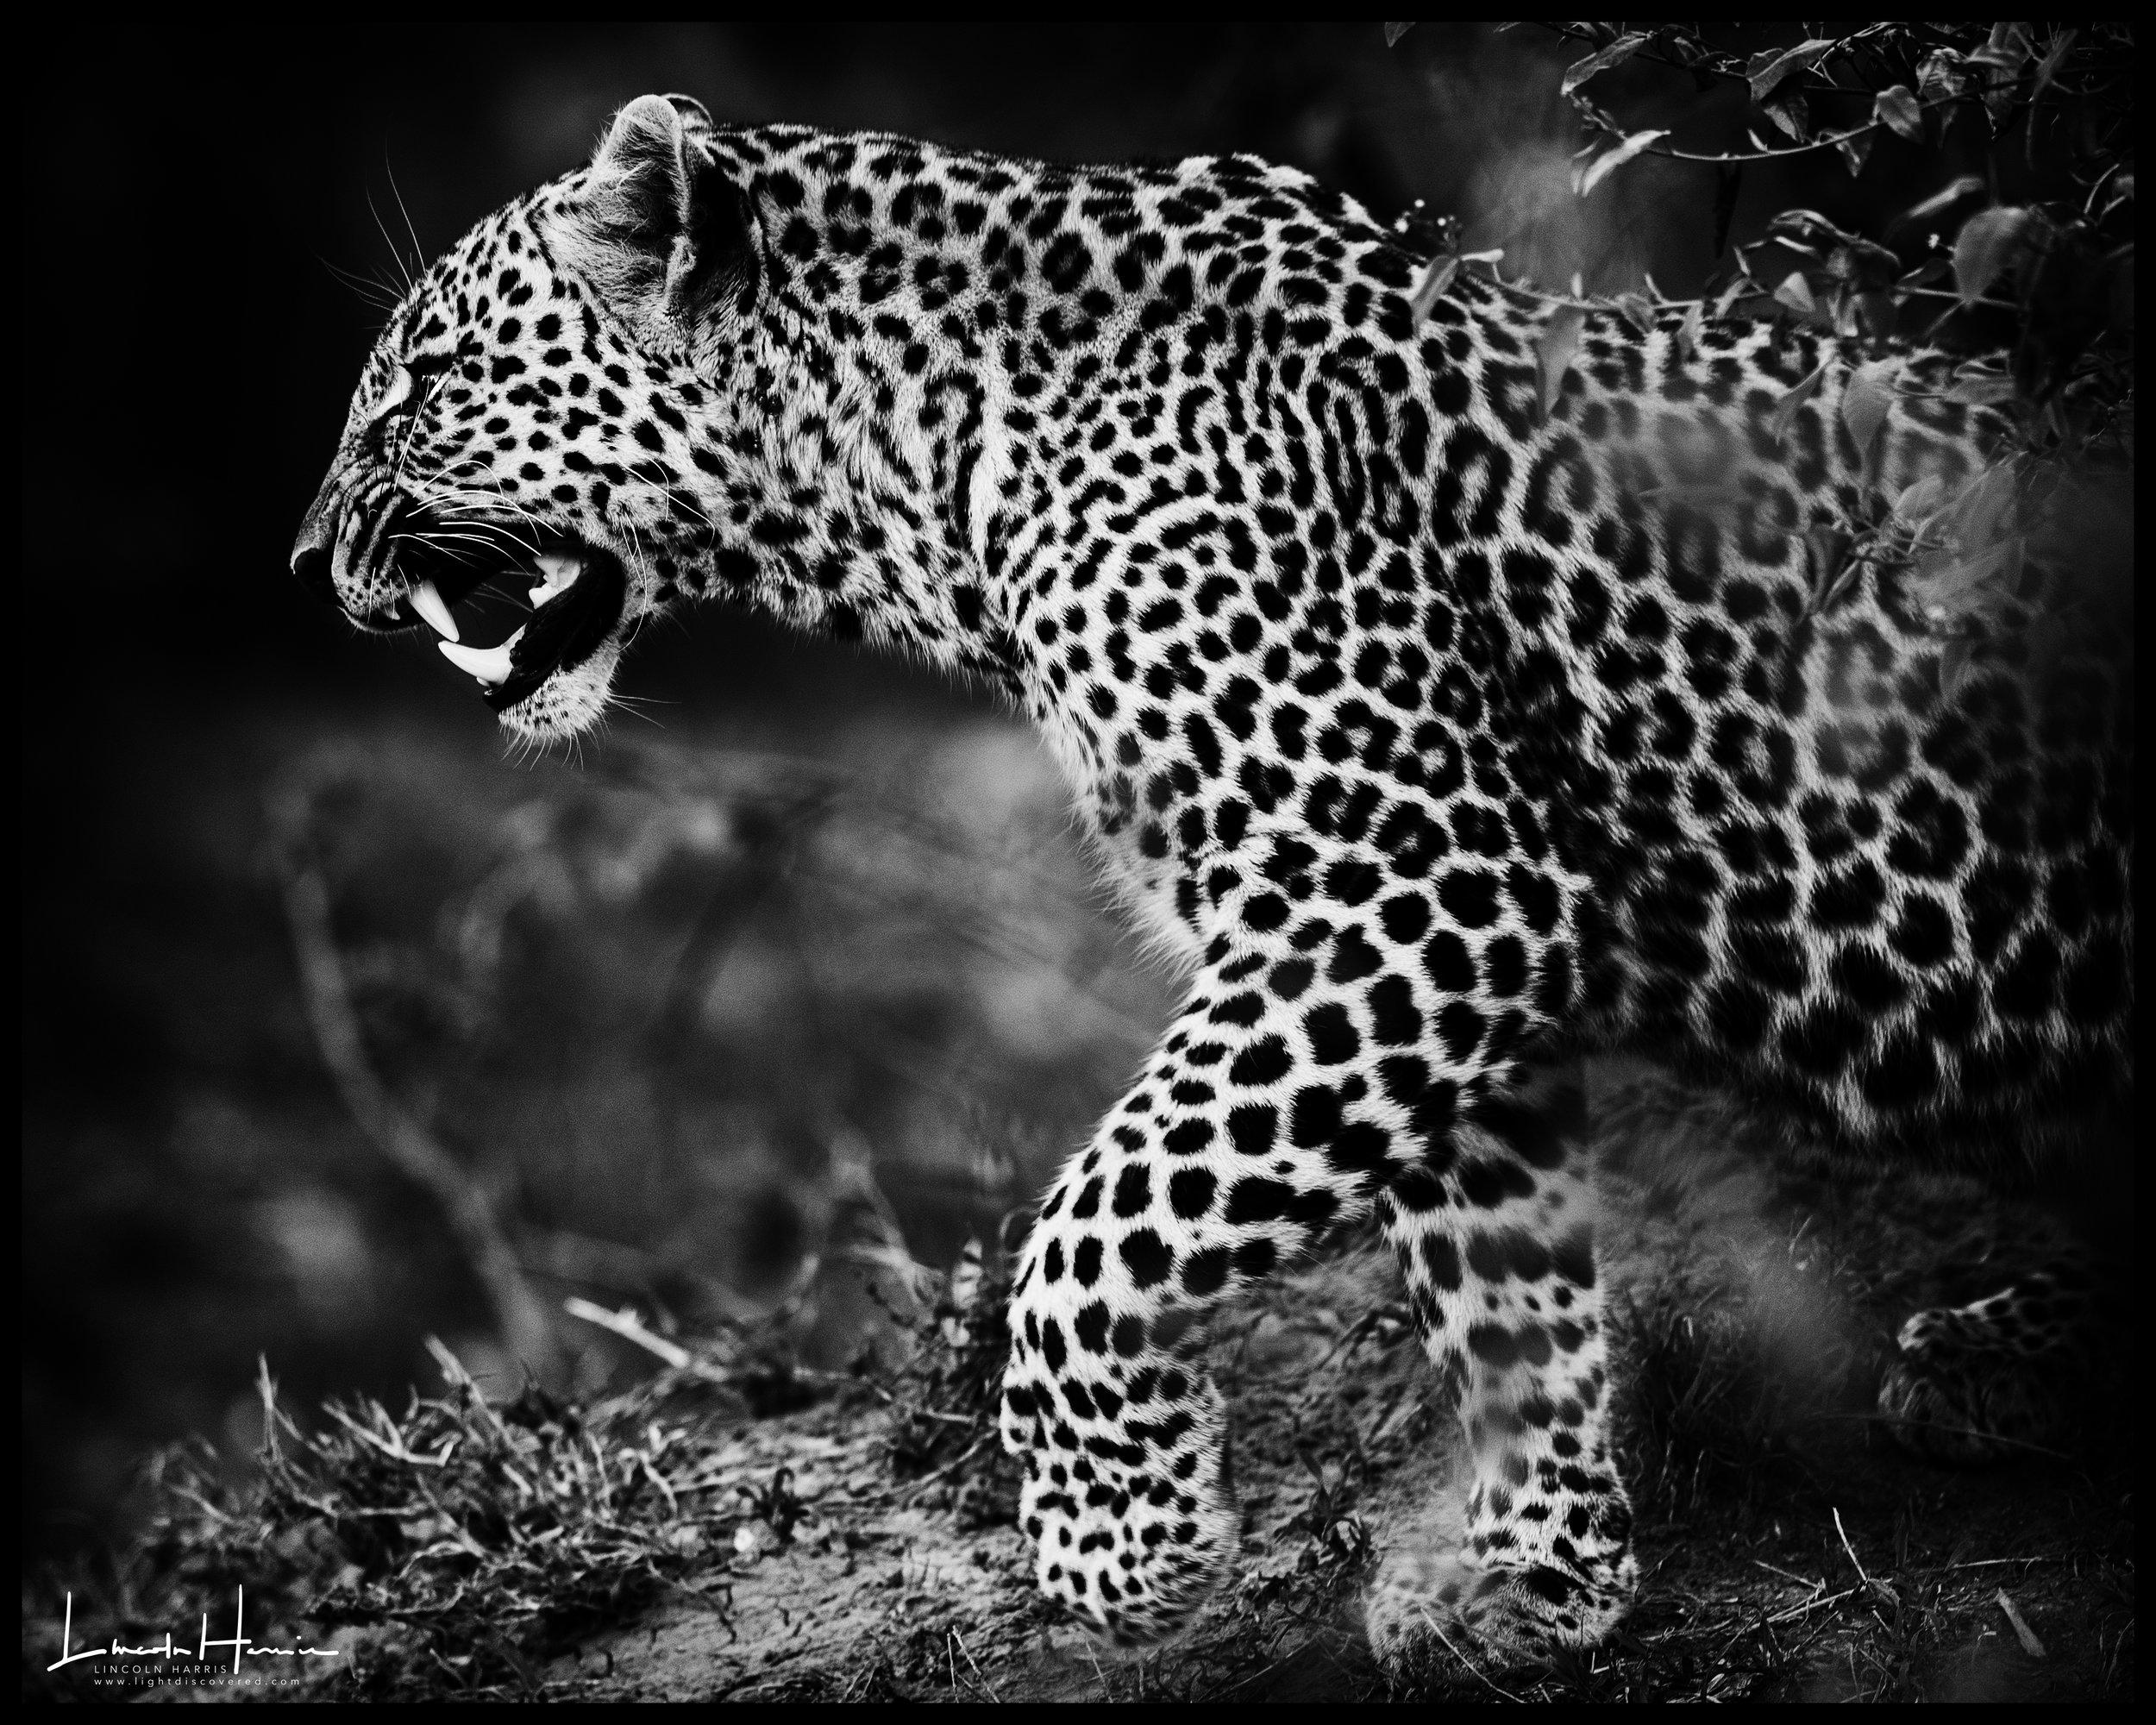 Leopard on the Prowl in the Maasai Mara '17